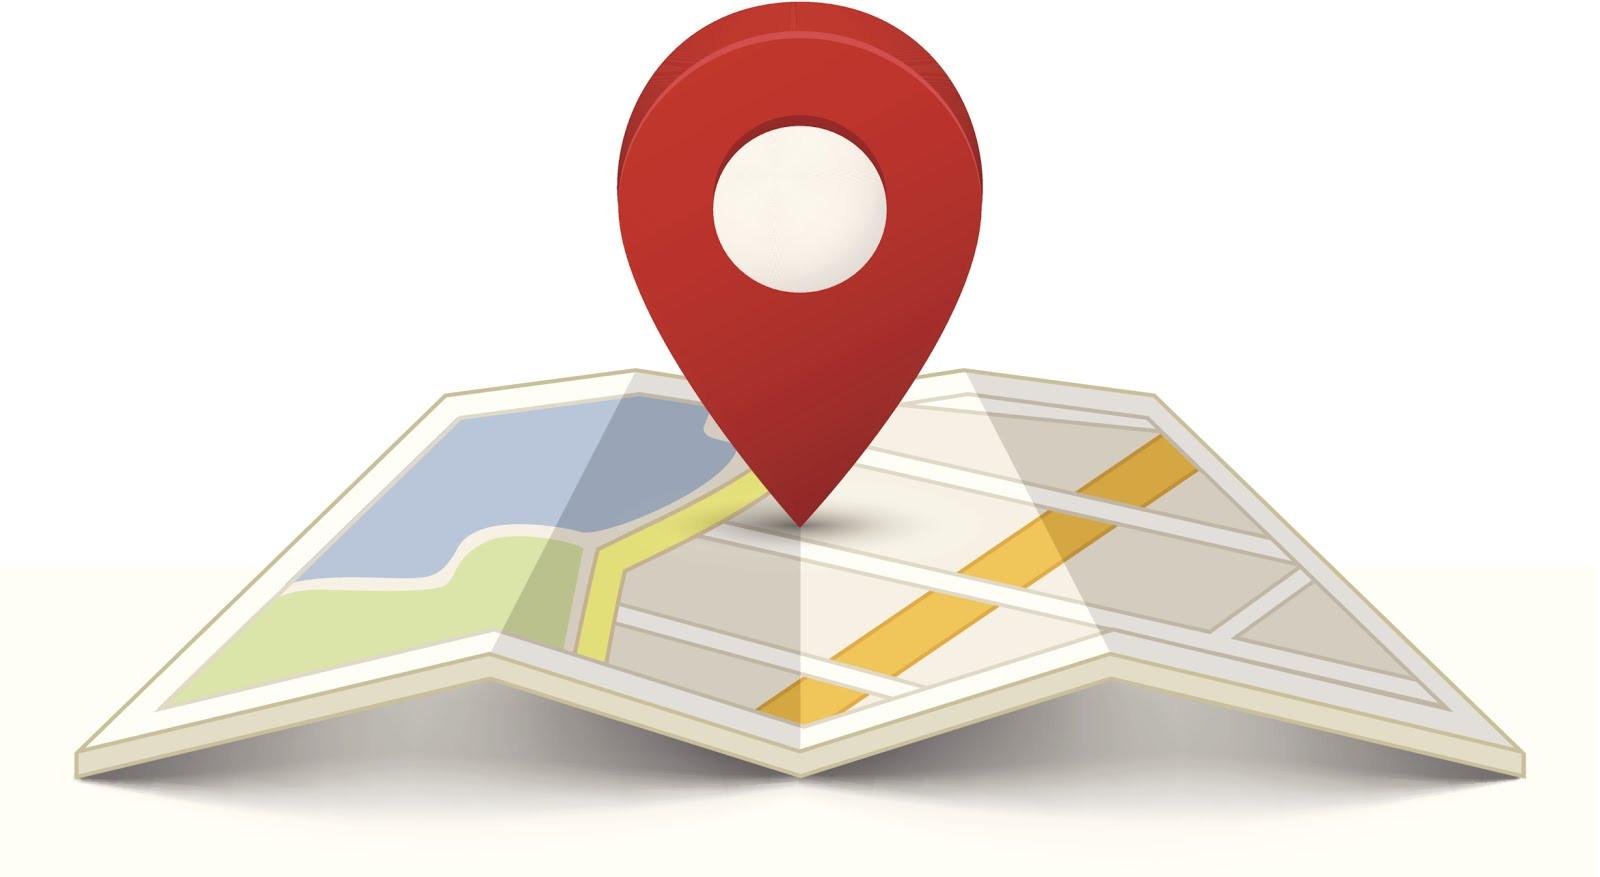 Local seo tipps zur lokalen suchmaschinenoptimierung for Find a home online